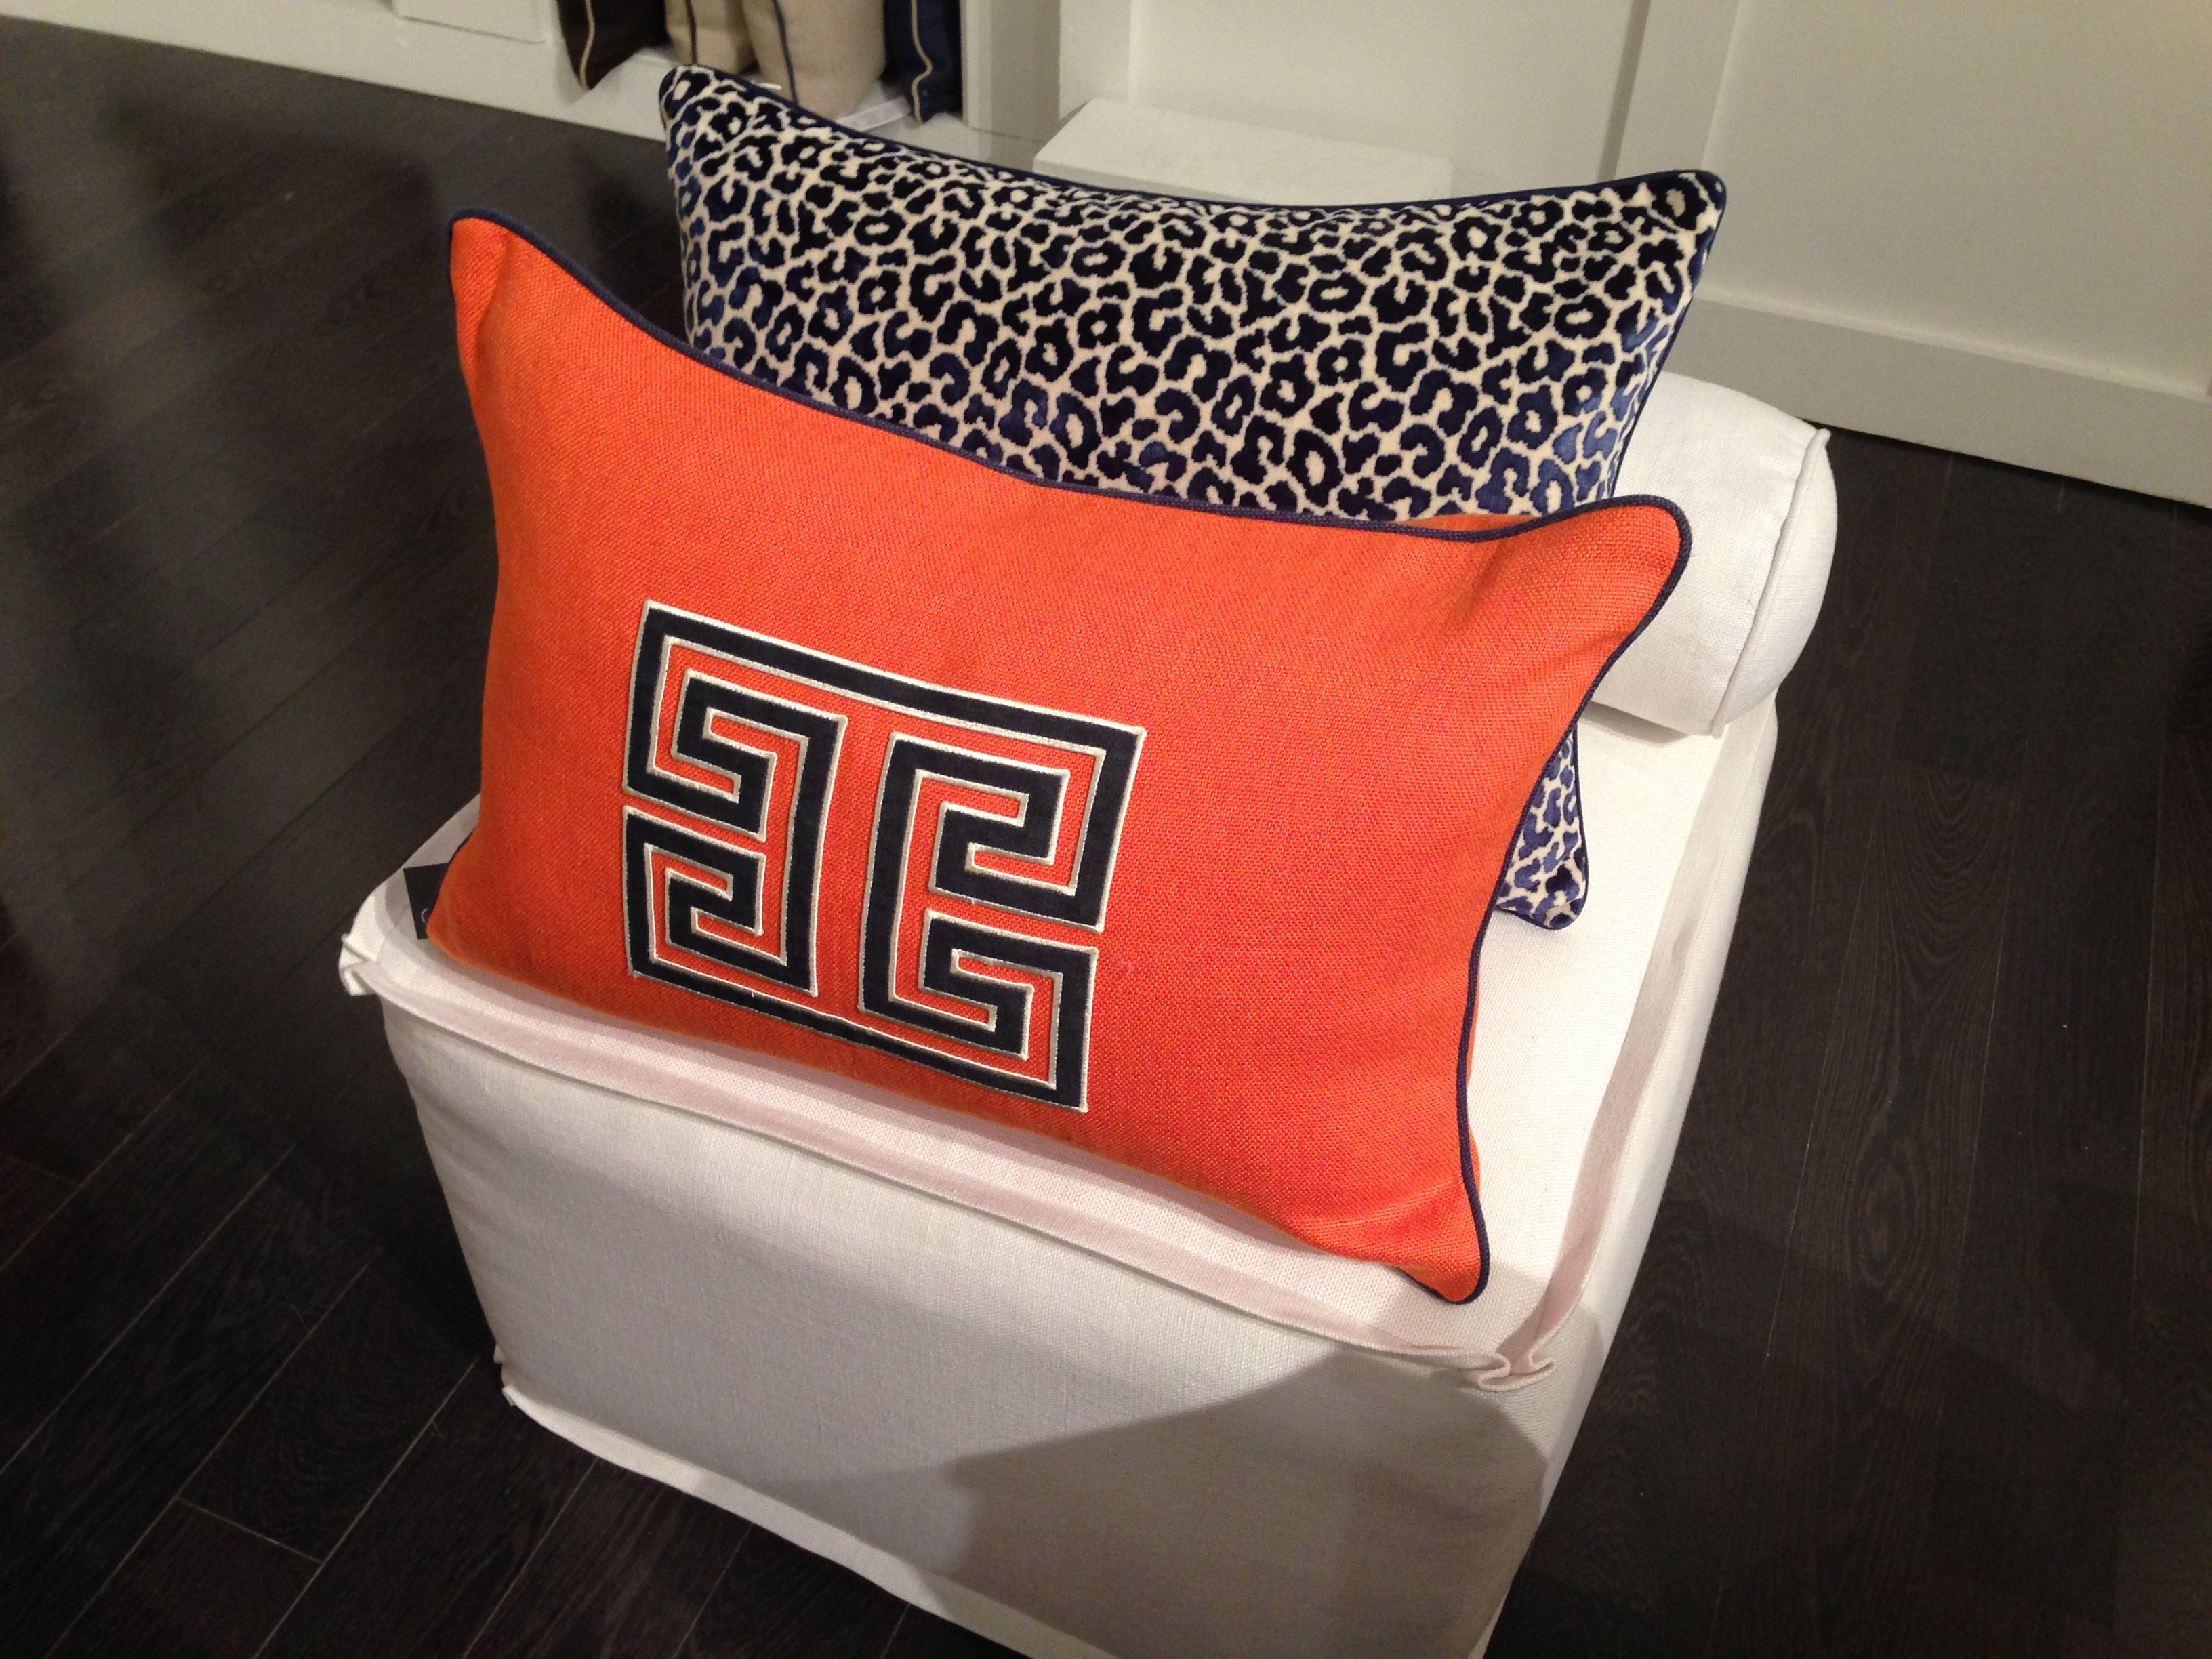 Ryan Studio Fret Applique Pillow | #hpmkt Spring 2014 | via Interiors For Families